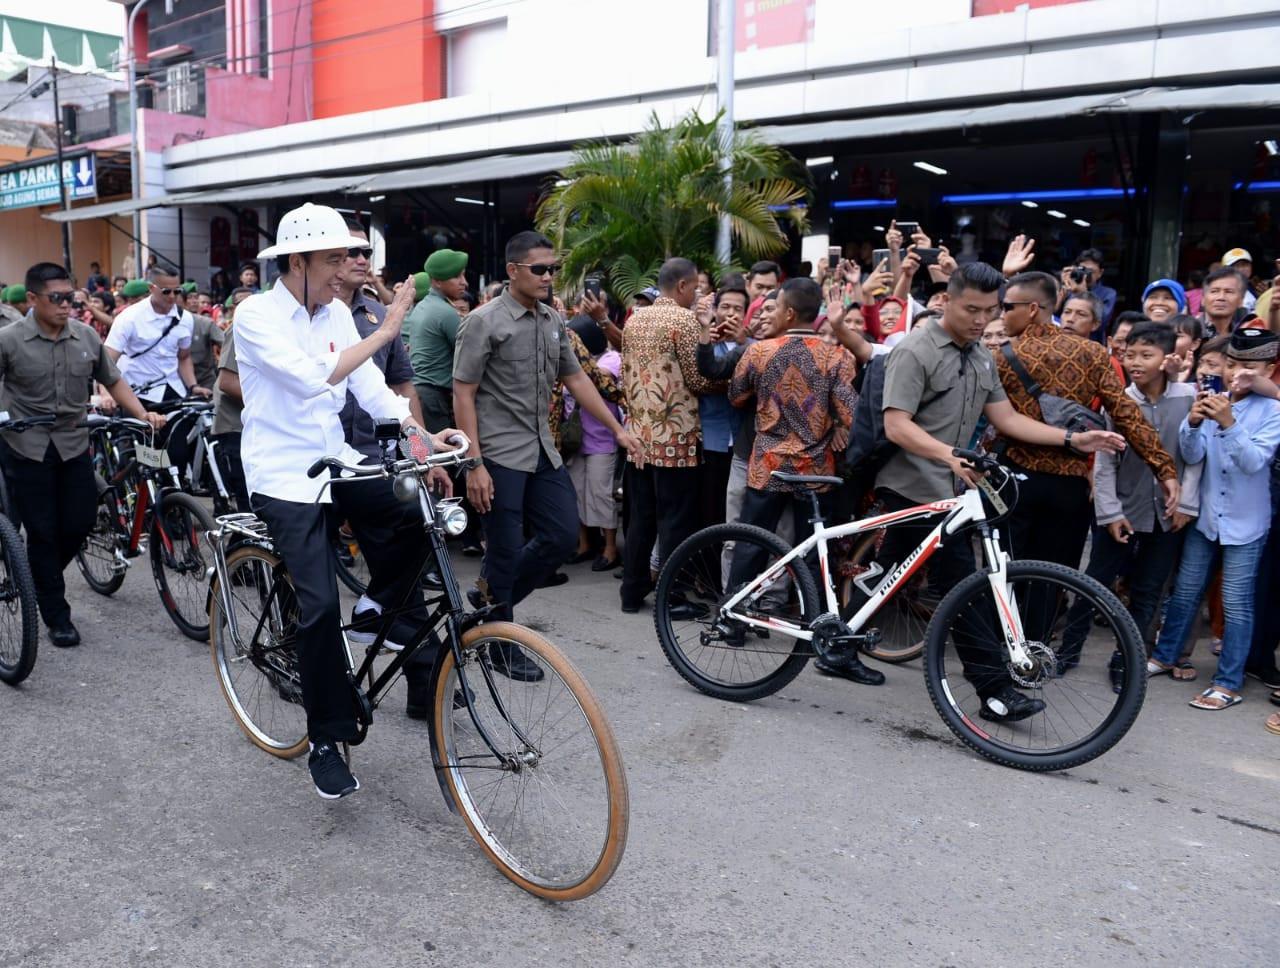 Jokowi Tinjau Proyek Pasar Johar dan Bersepeda Kota Tua Semarang - JPNN.com